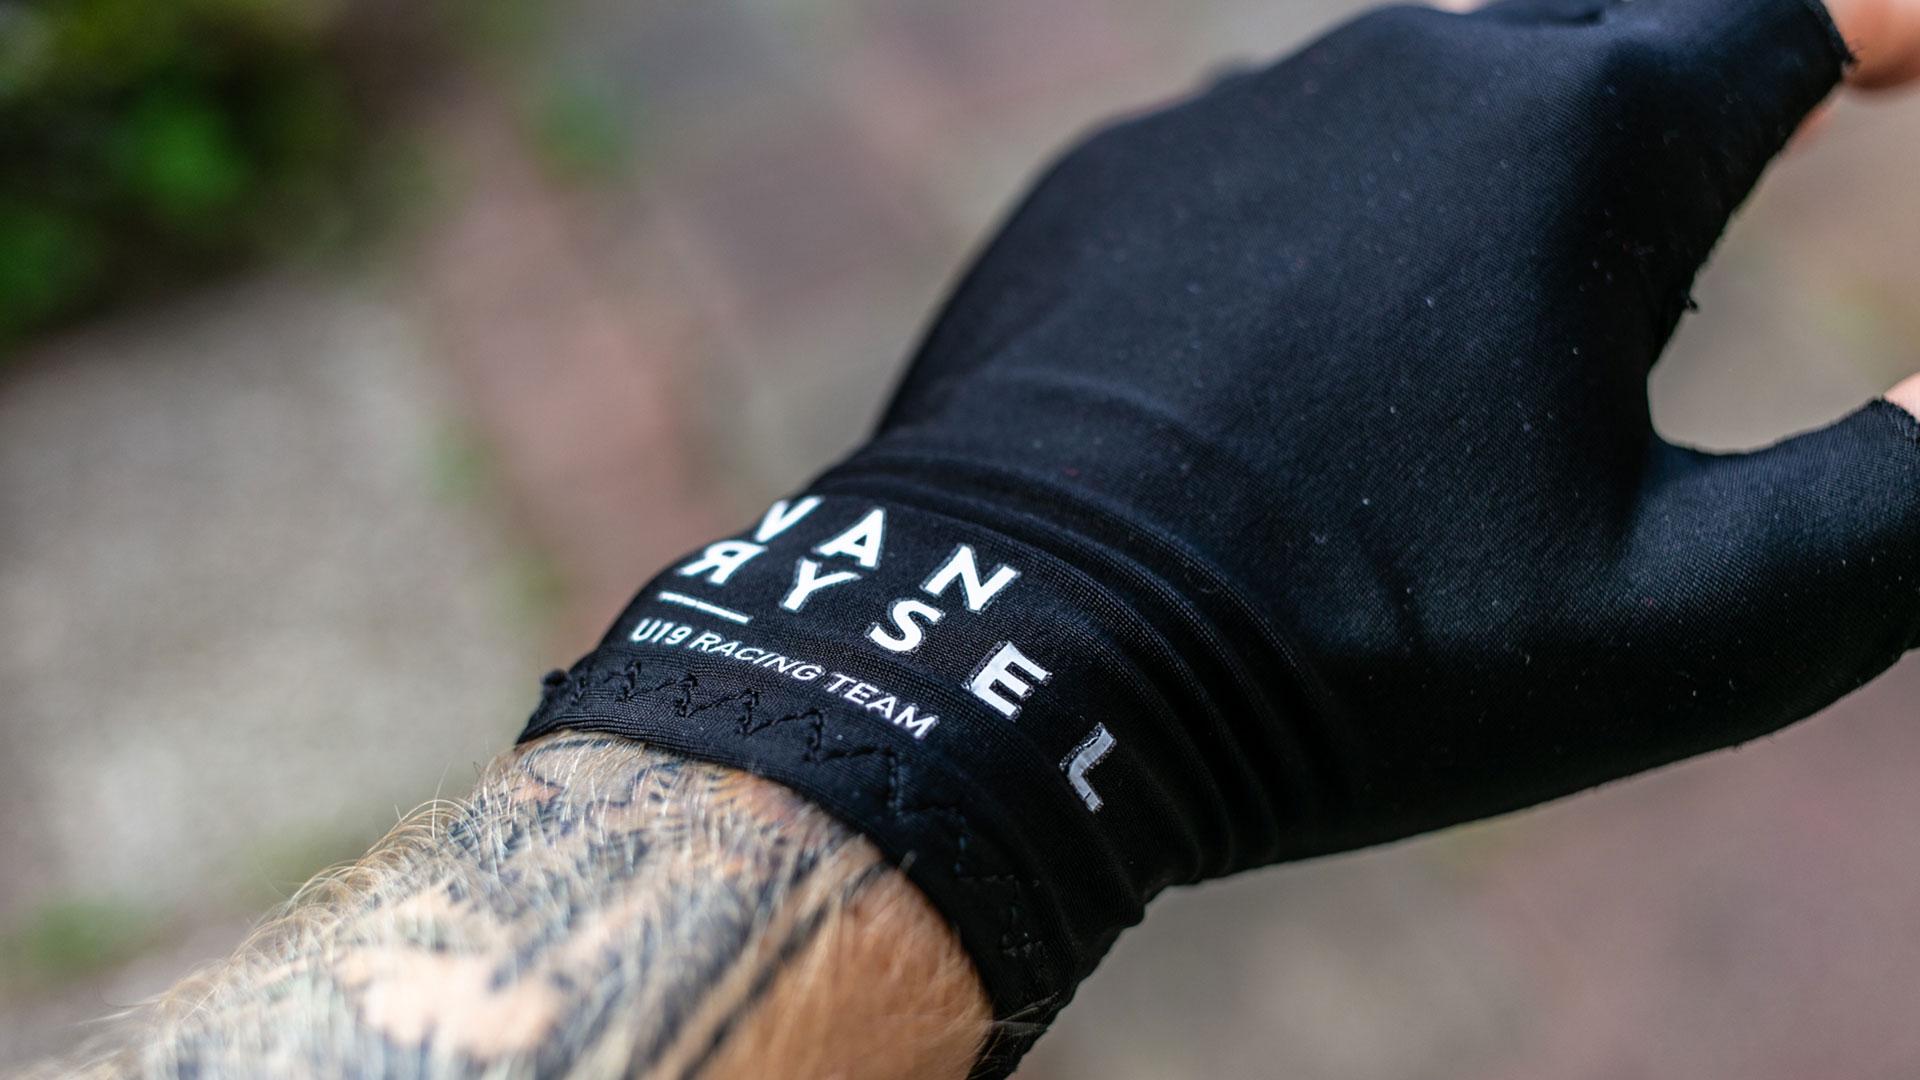 Van Rysel fietskleding (Decathlon): review